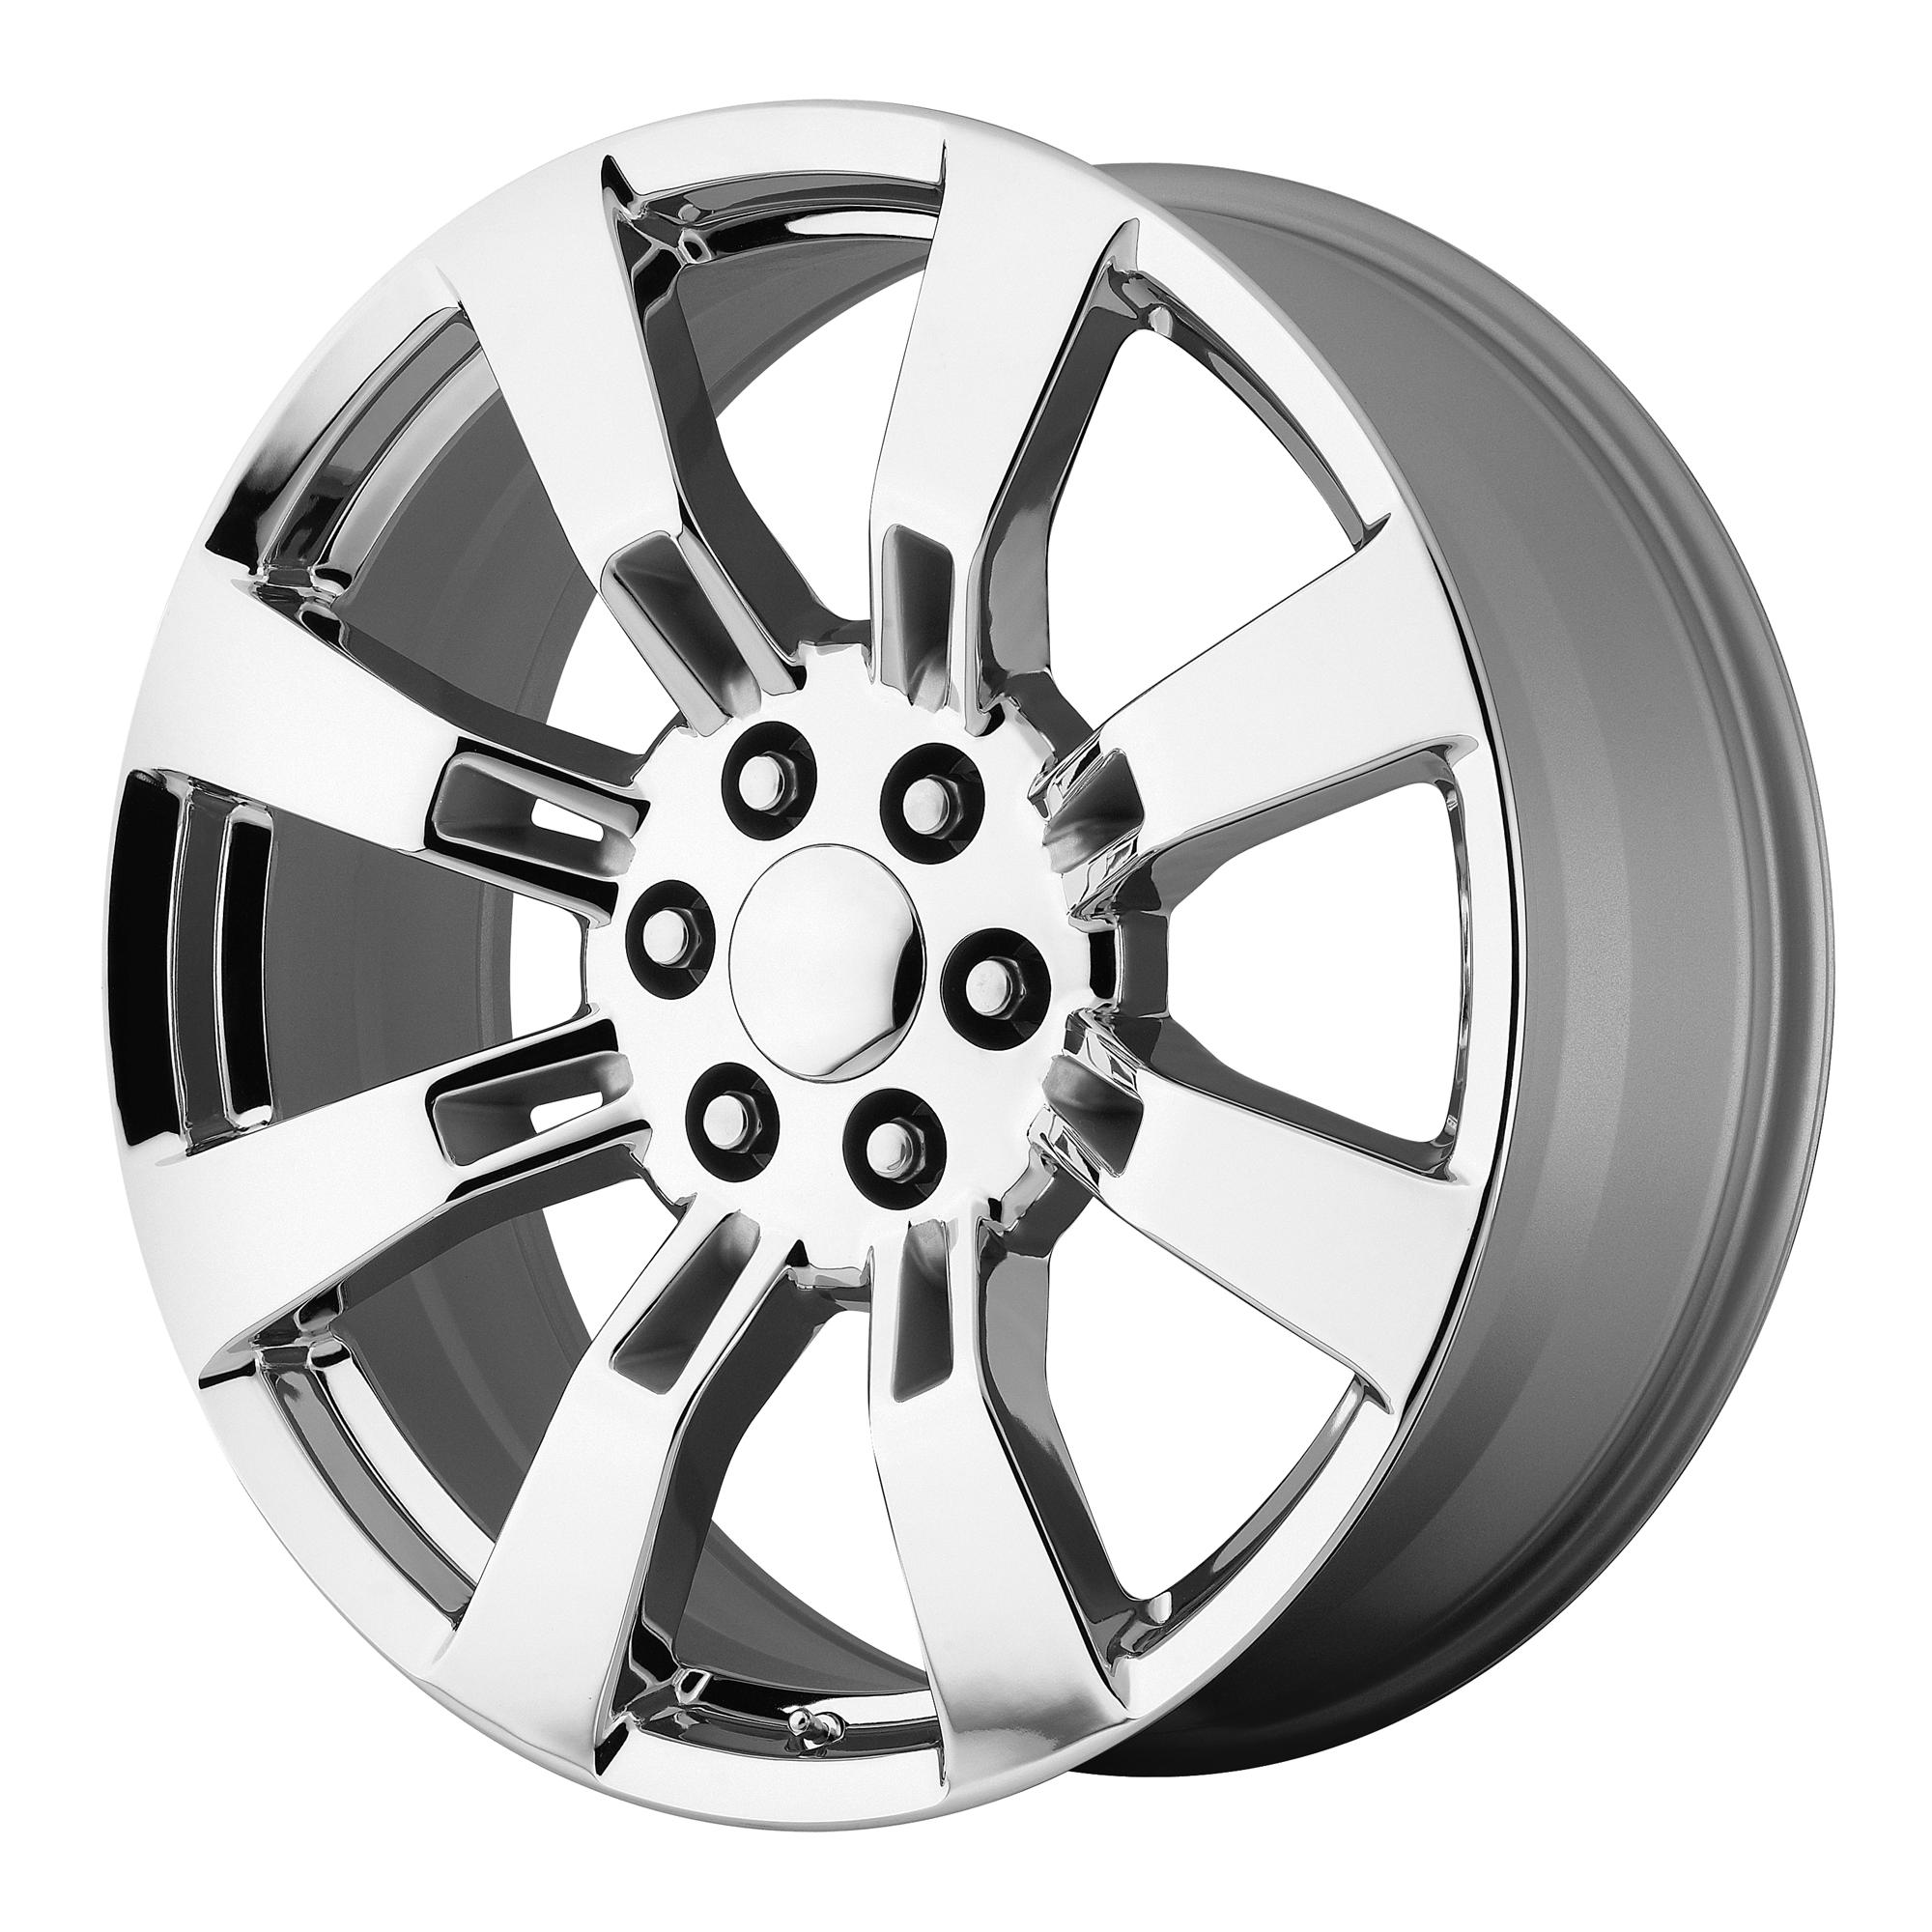 OE Creations Replica Wheels OE Creations PR144 Chrome